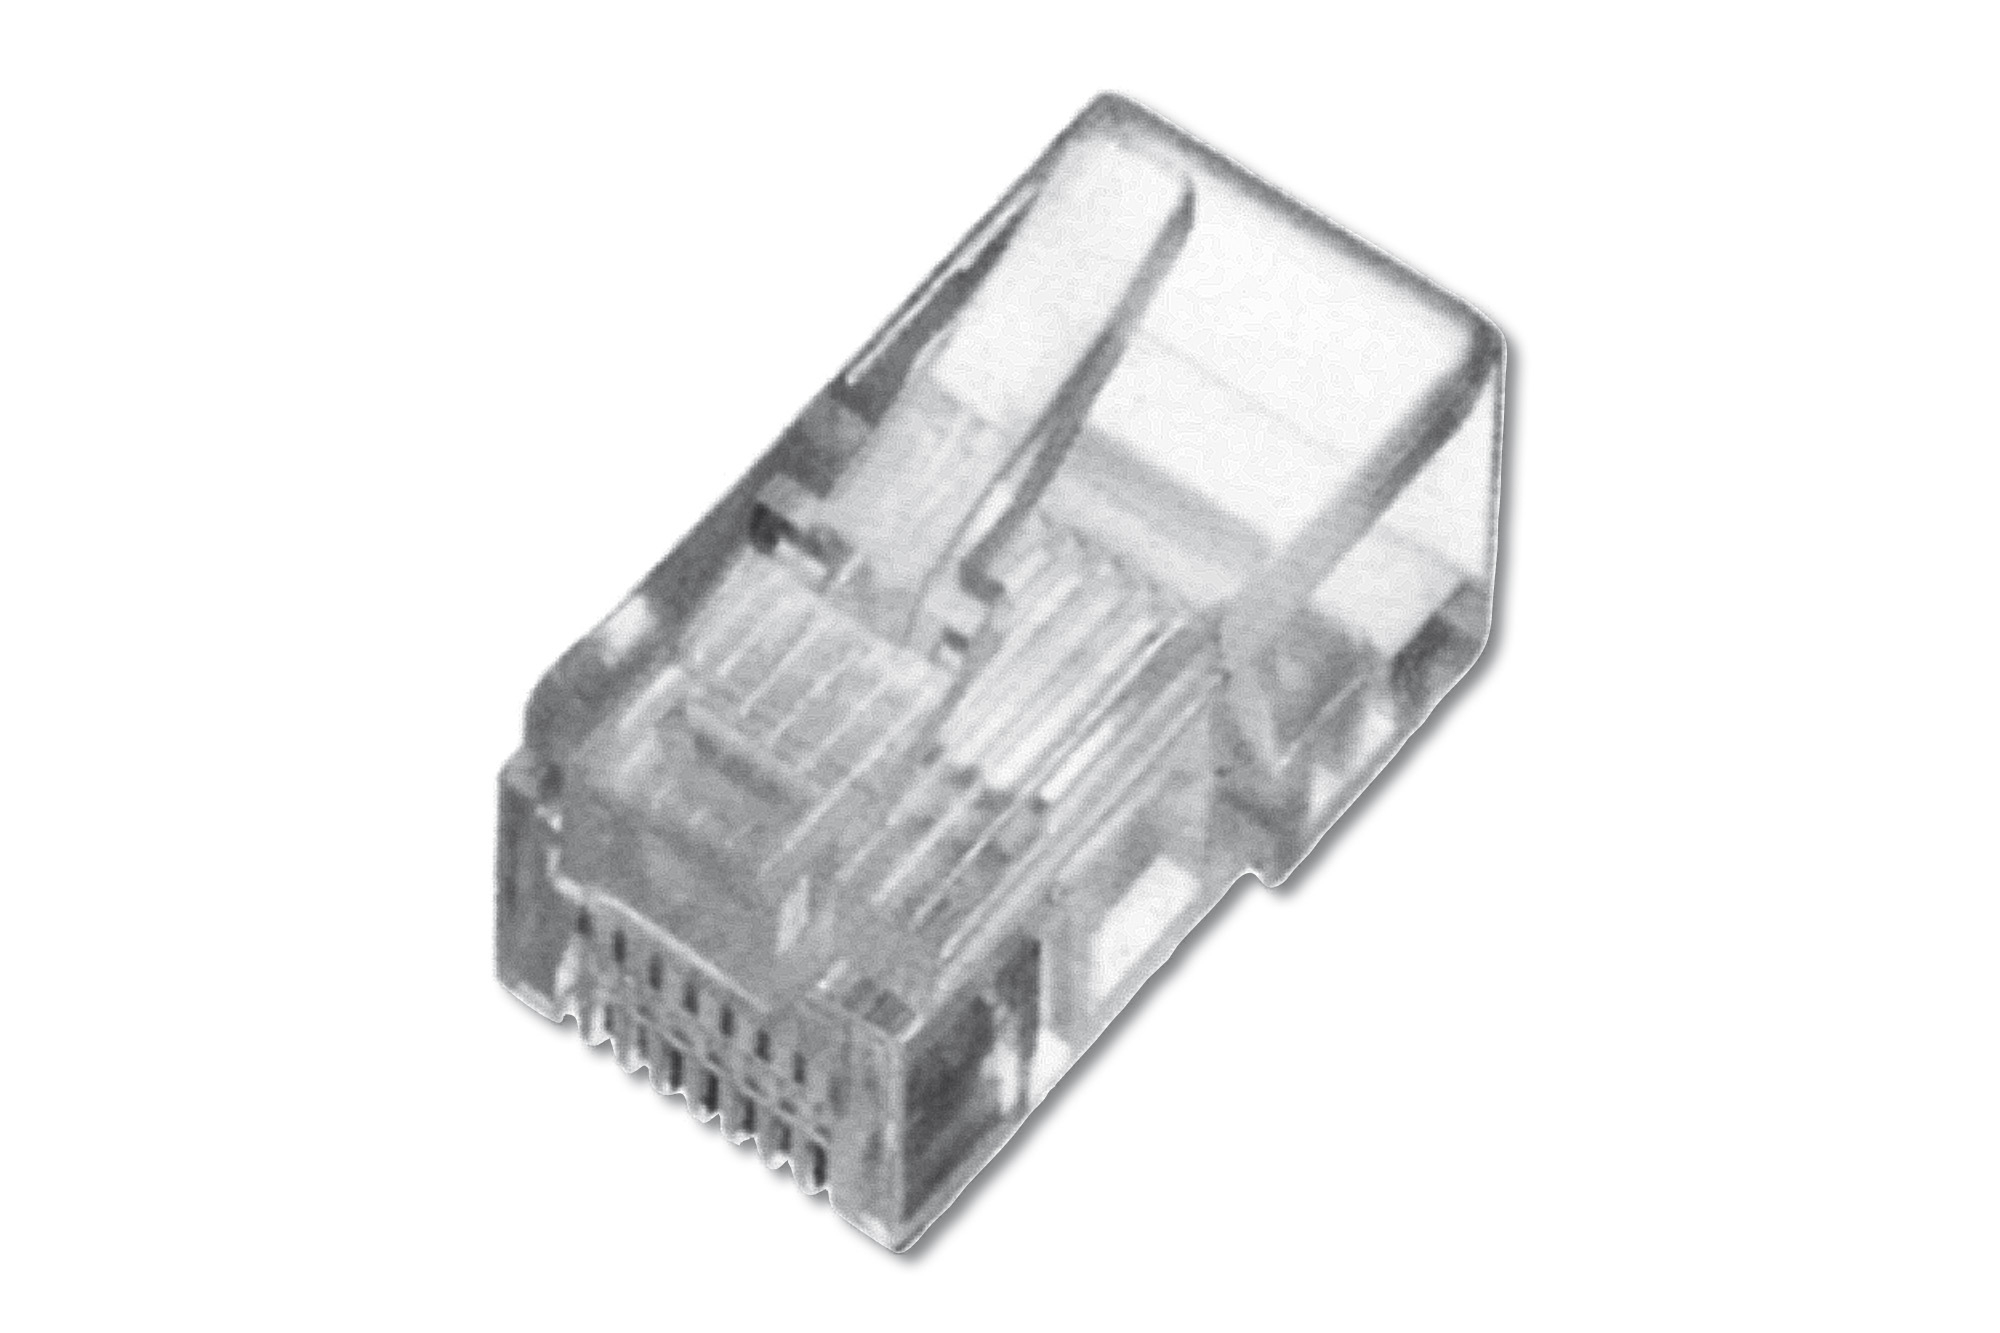 ASSMANN Electronic A-MO 8/8 SF kabel-connector RJ-45 8P8C